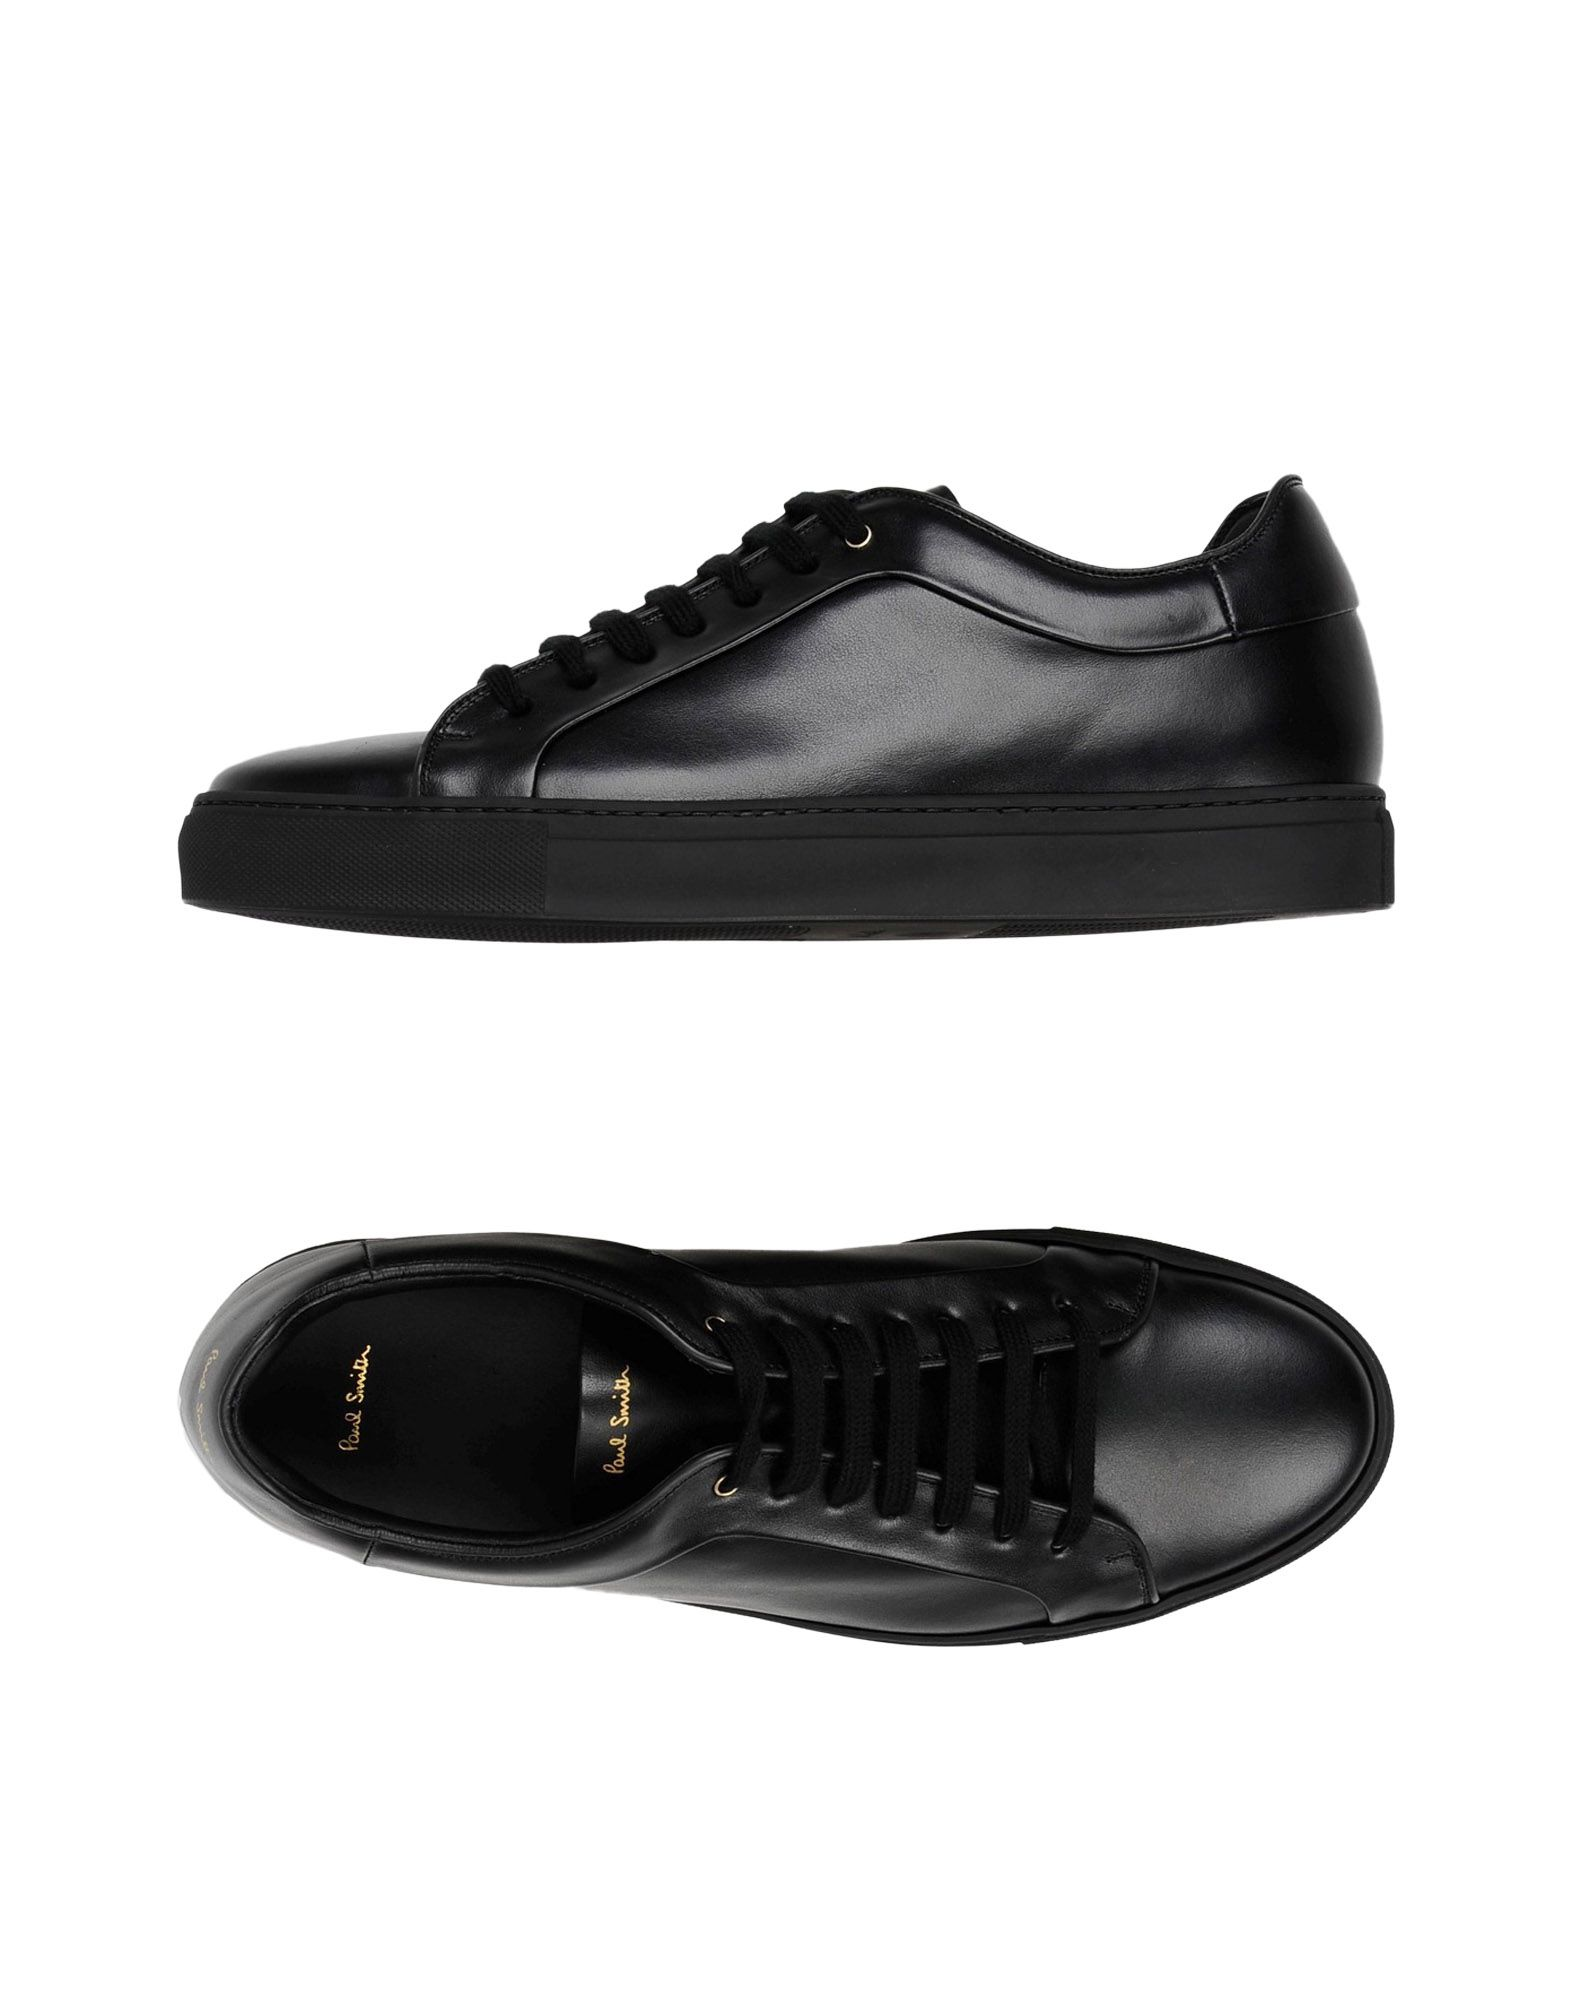 Sneakers Paul Smith Mens Shoe Basso Black - Uomo - 11312160QM